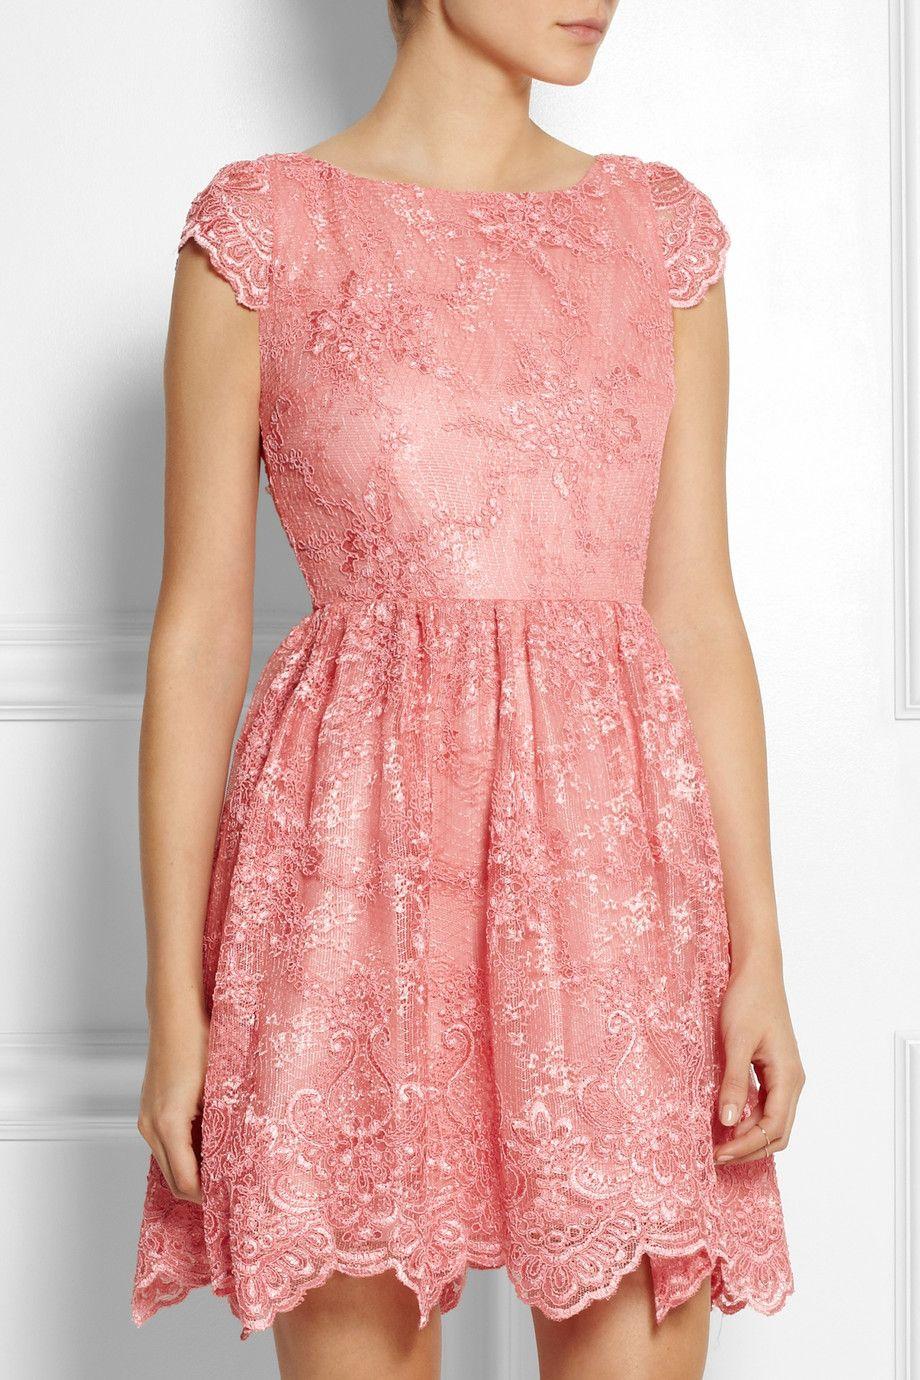 Alice + Olivia | Zenden embroidered lace mini dress | NET-A-PORTER ...